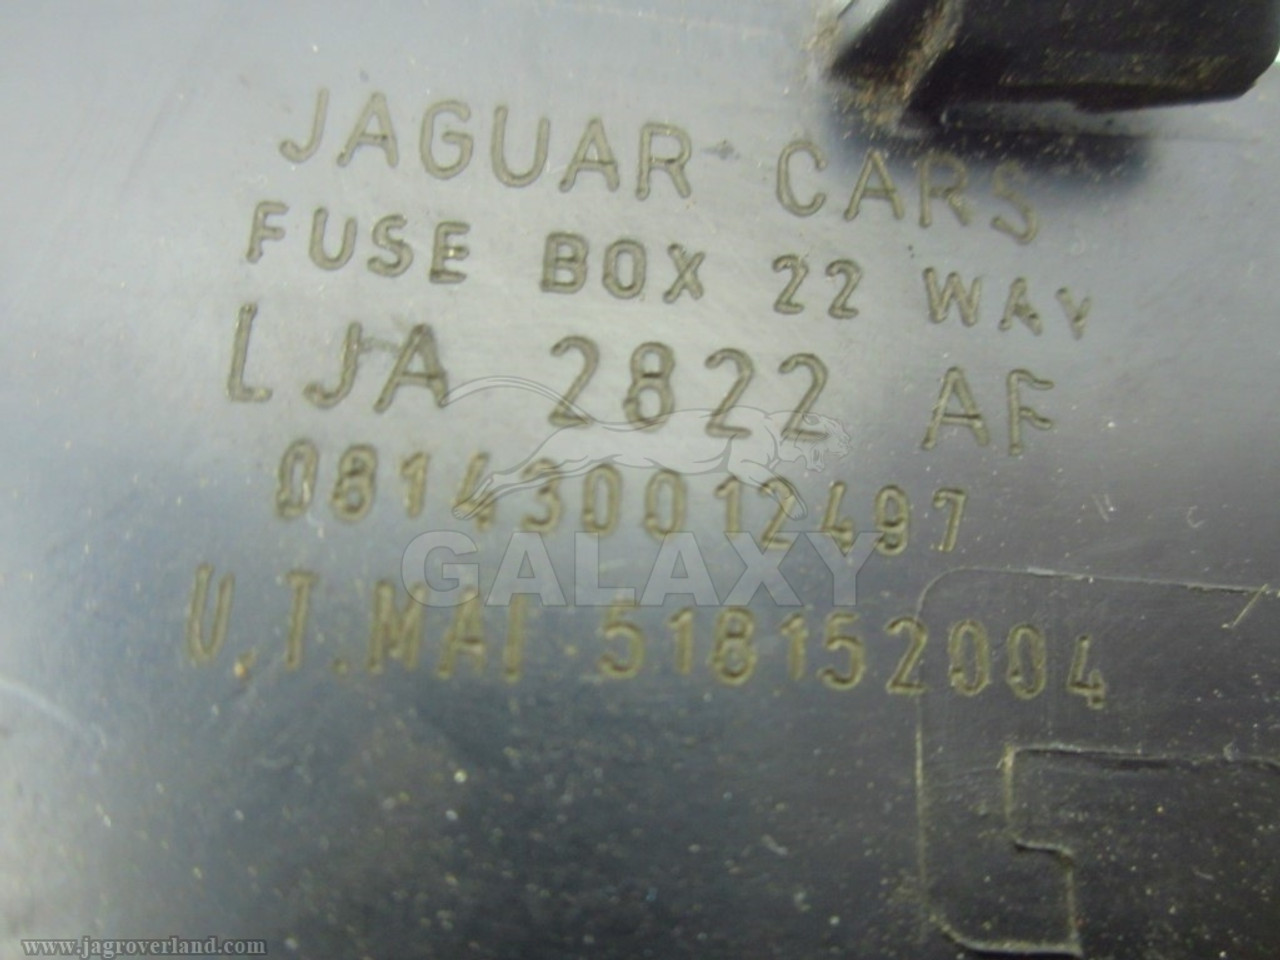 hight resolution of 97 99 xk8 fuse box lja2822af